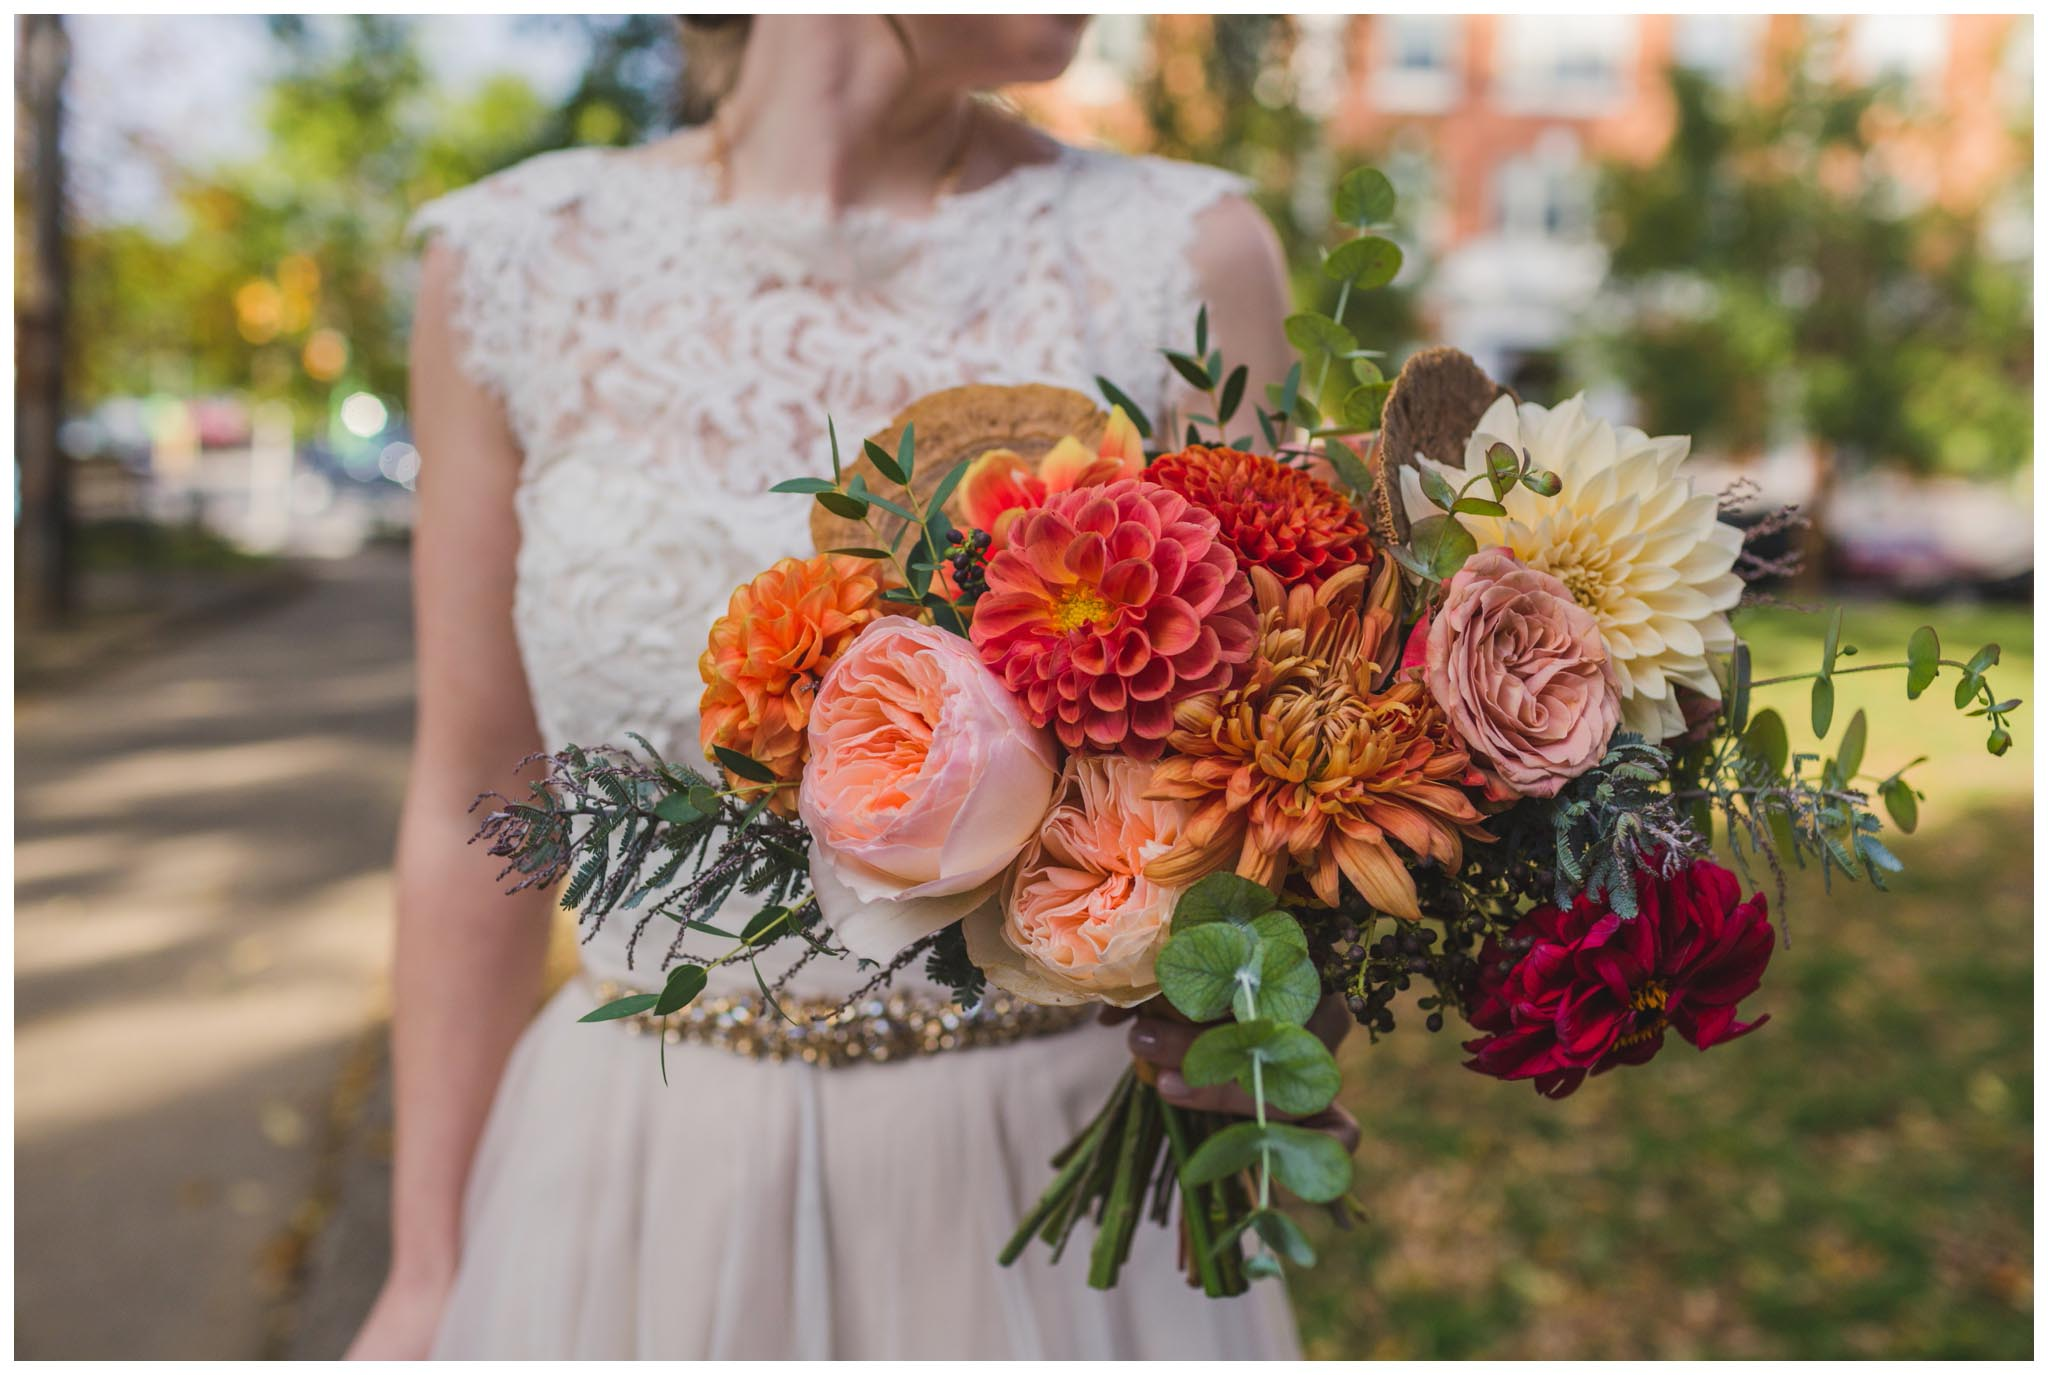 Falls Flowers, bouquet, wedding